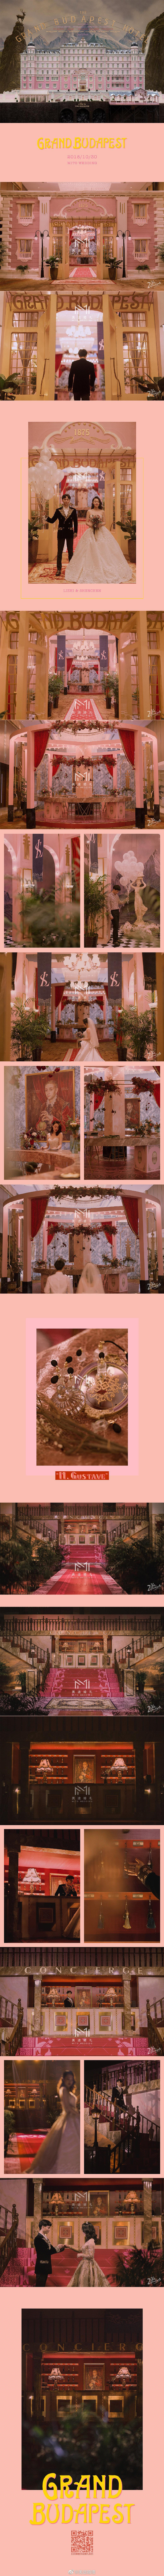 The Grand Budapest Hotel致敬韦斯·安德森永远的经典《布达佩斯大饭